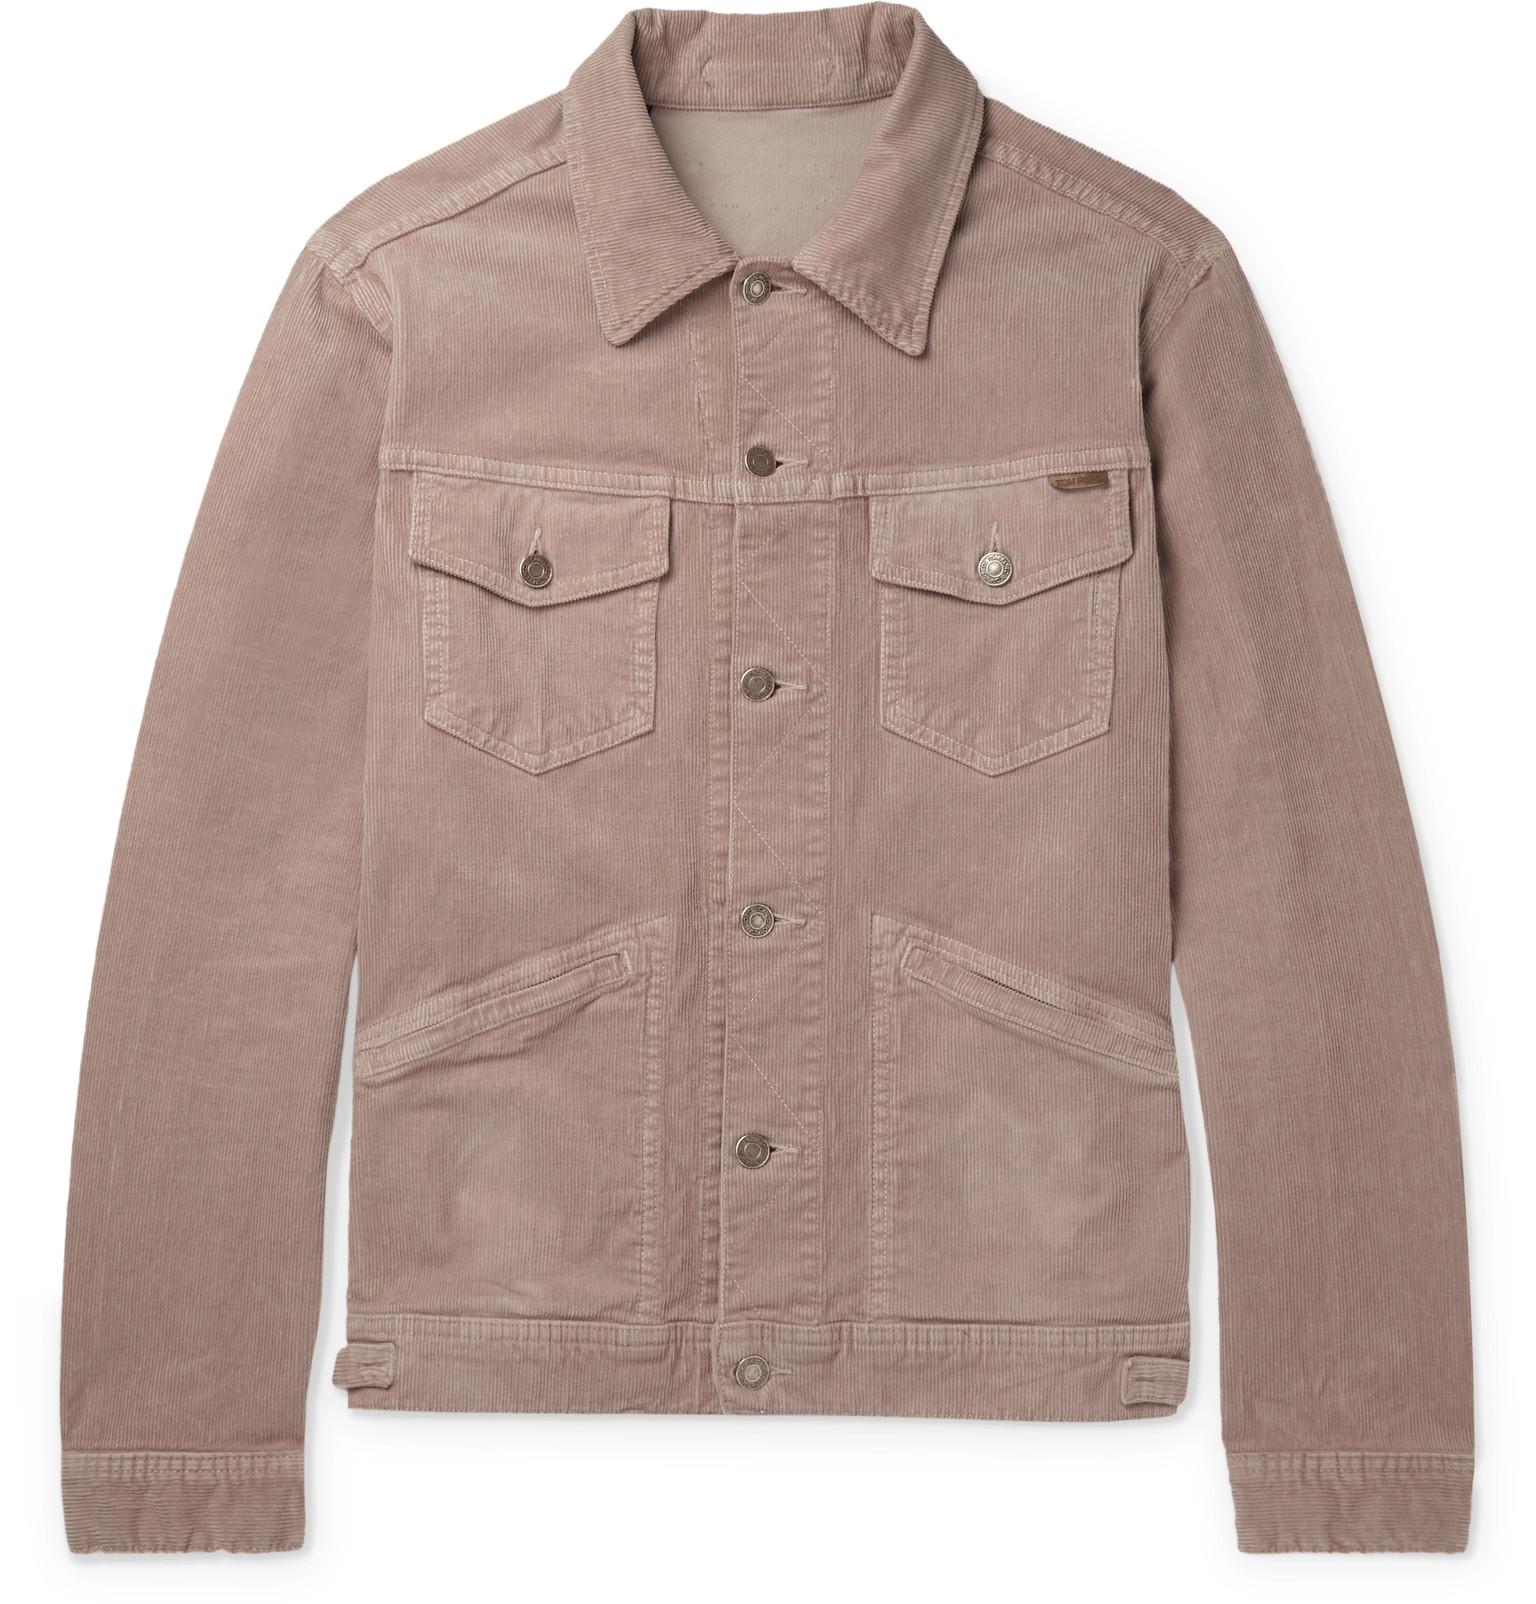 dc7c65c1e47 TOM FORD - Stretch-Cotton Corduroy Jacket